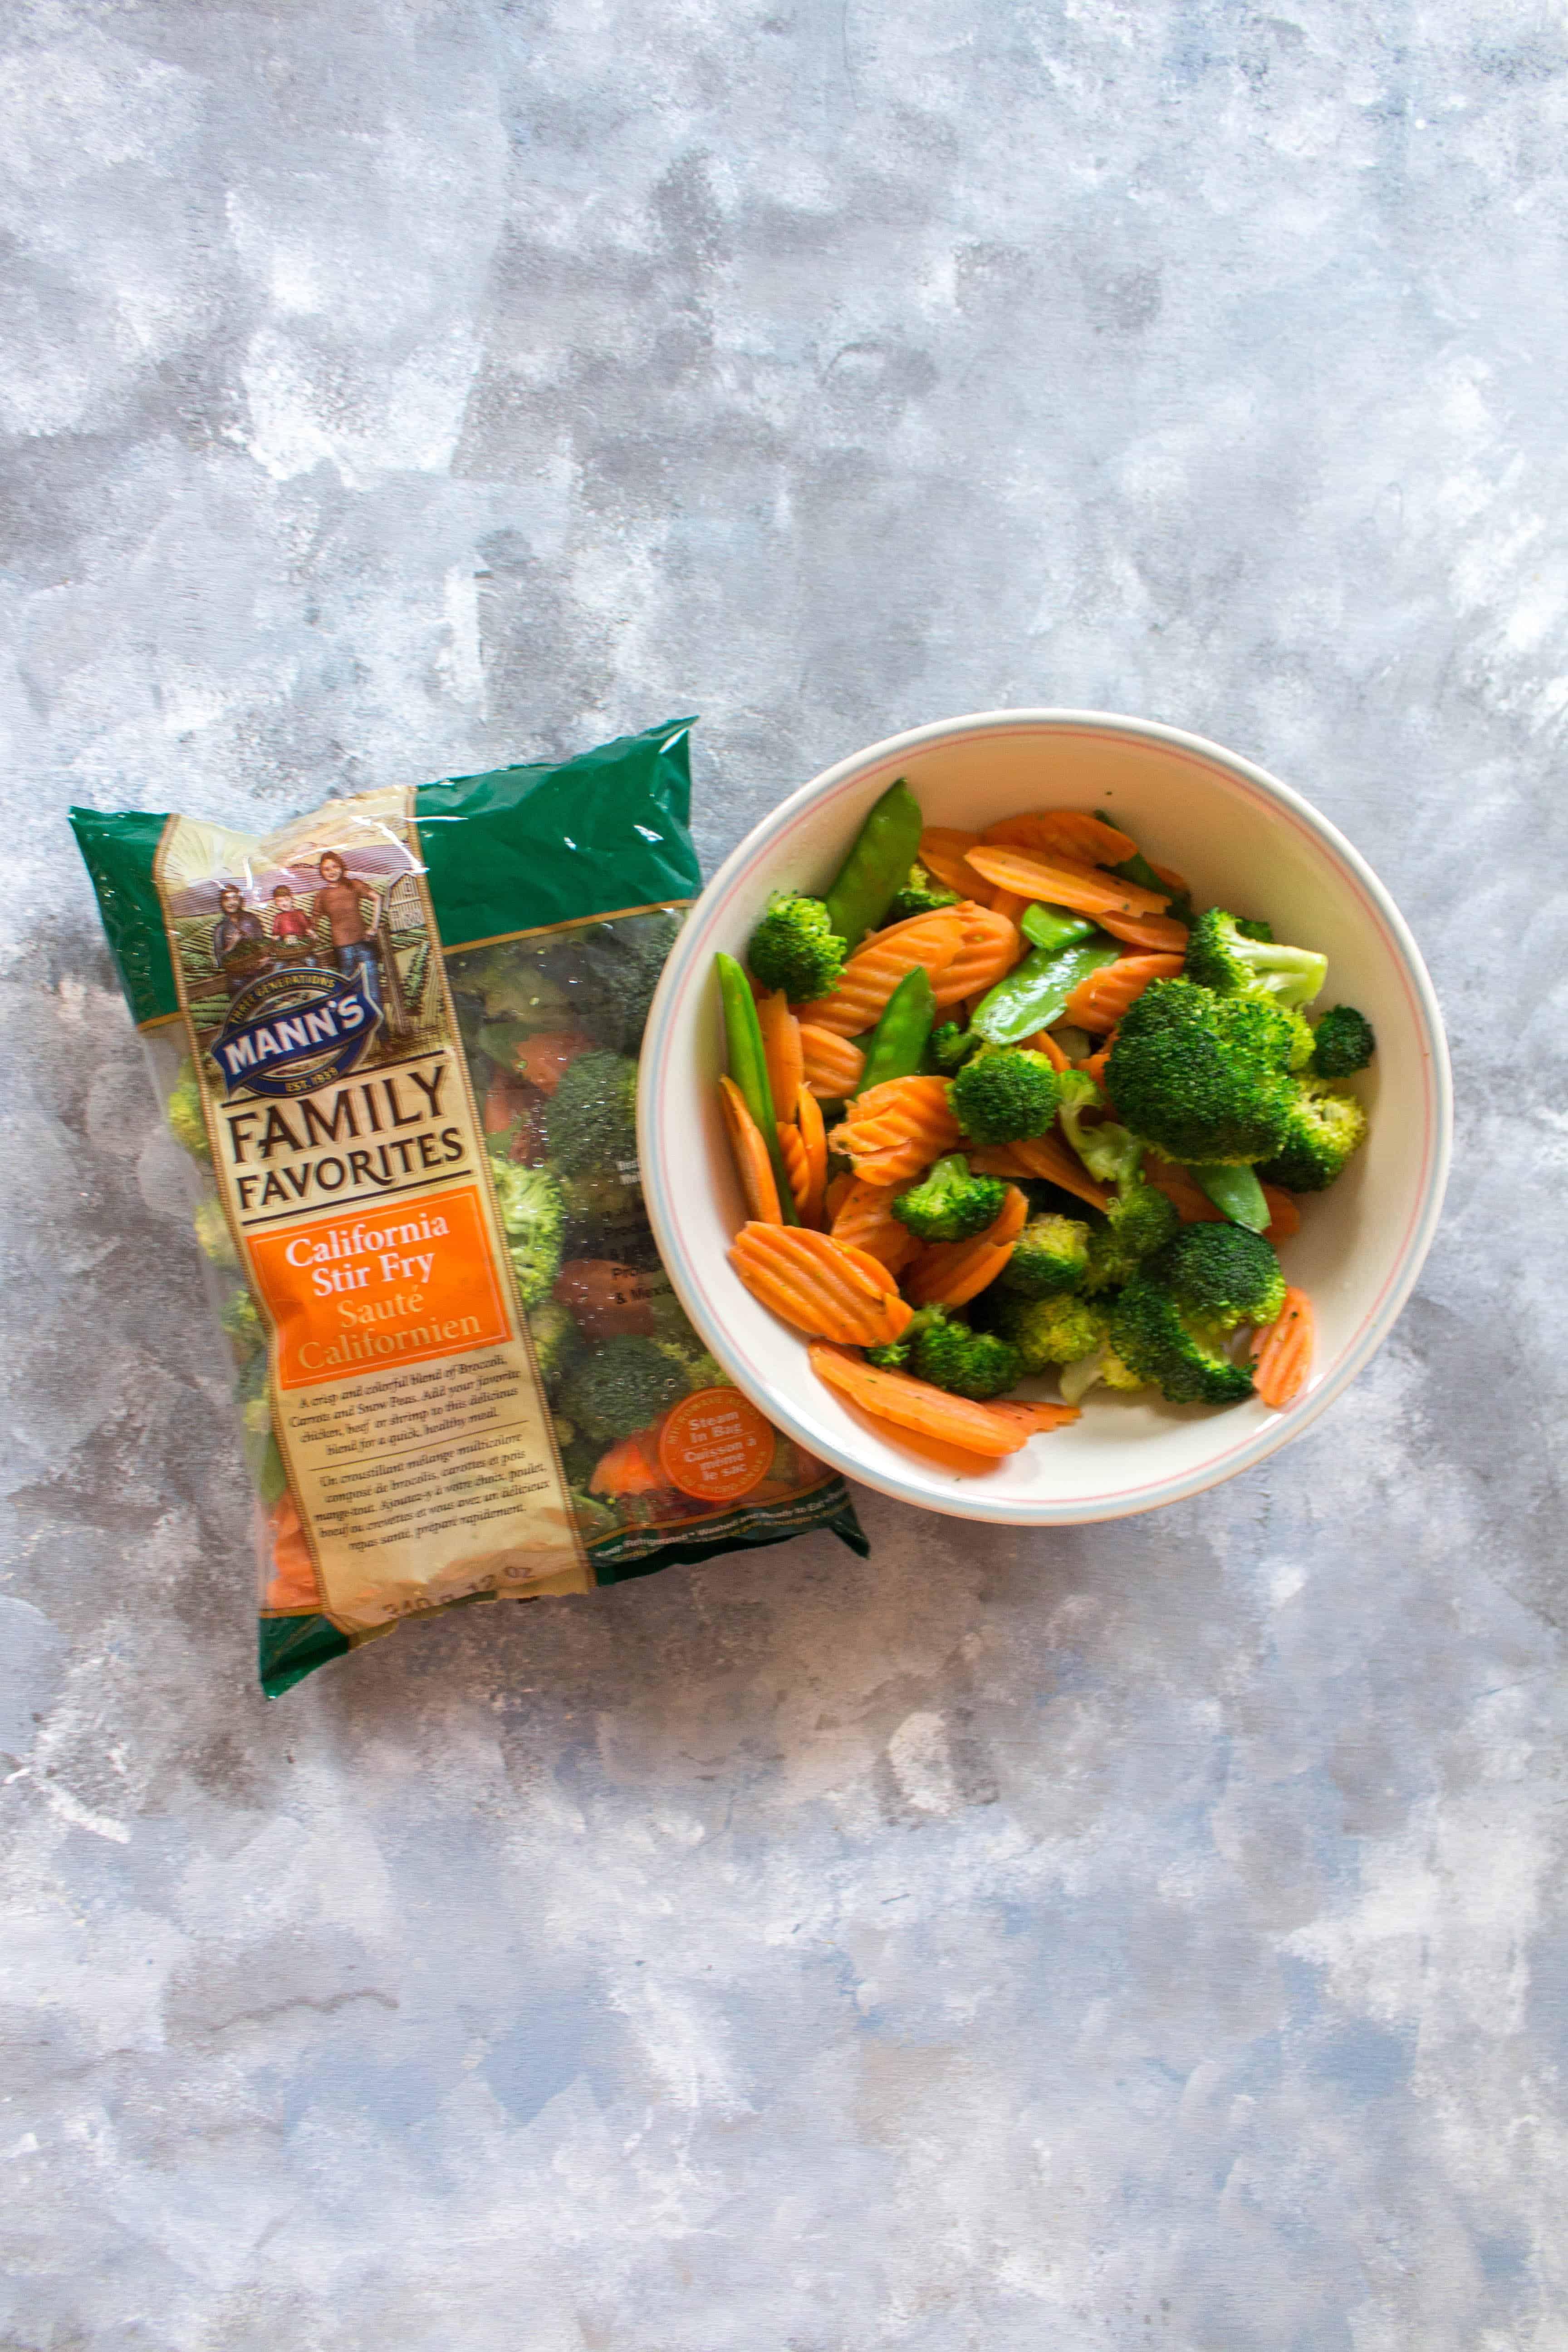 Mann's Fresh Vegetables California Stir Fry